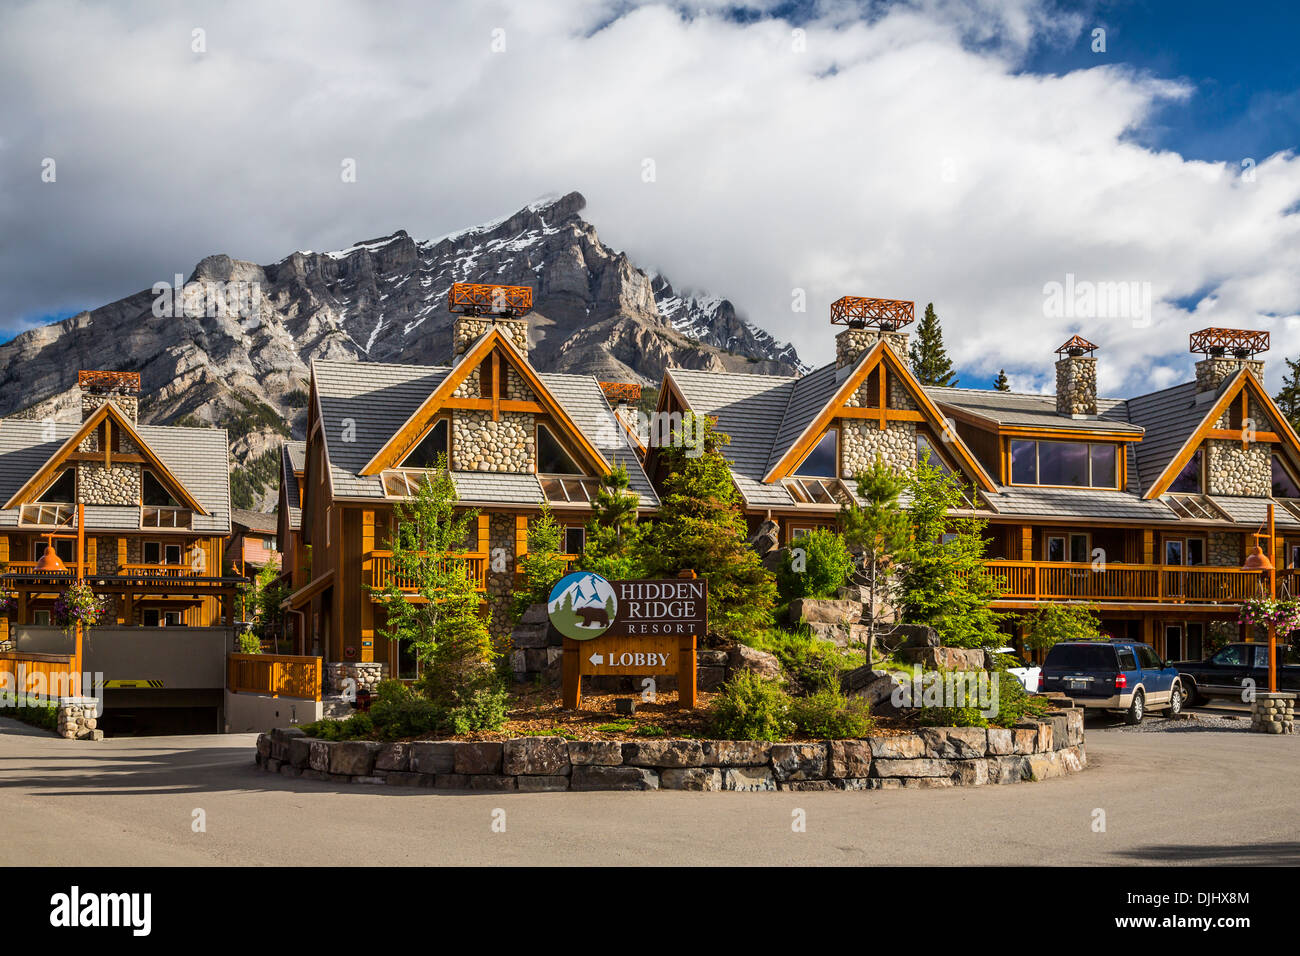 The Hidden Ridge Resort on Tunnel Mountain in Banff, Banff National Park, Alberta, Canada. - Stock Image